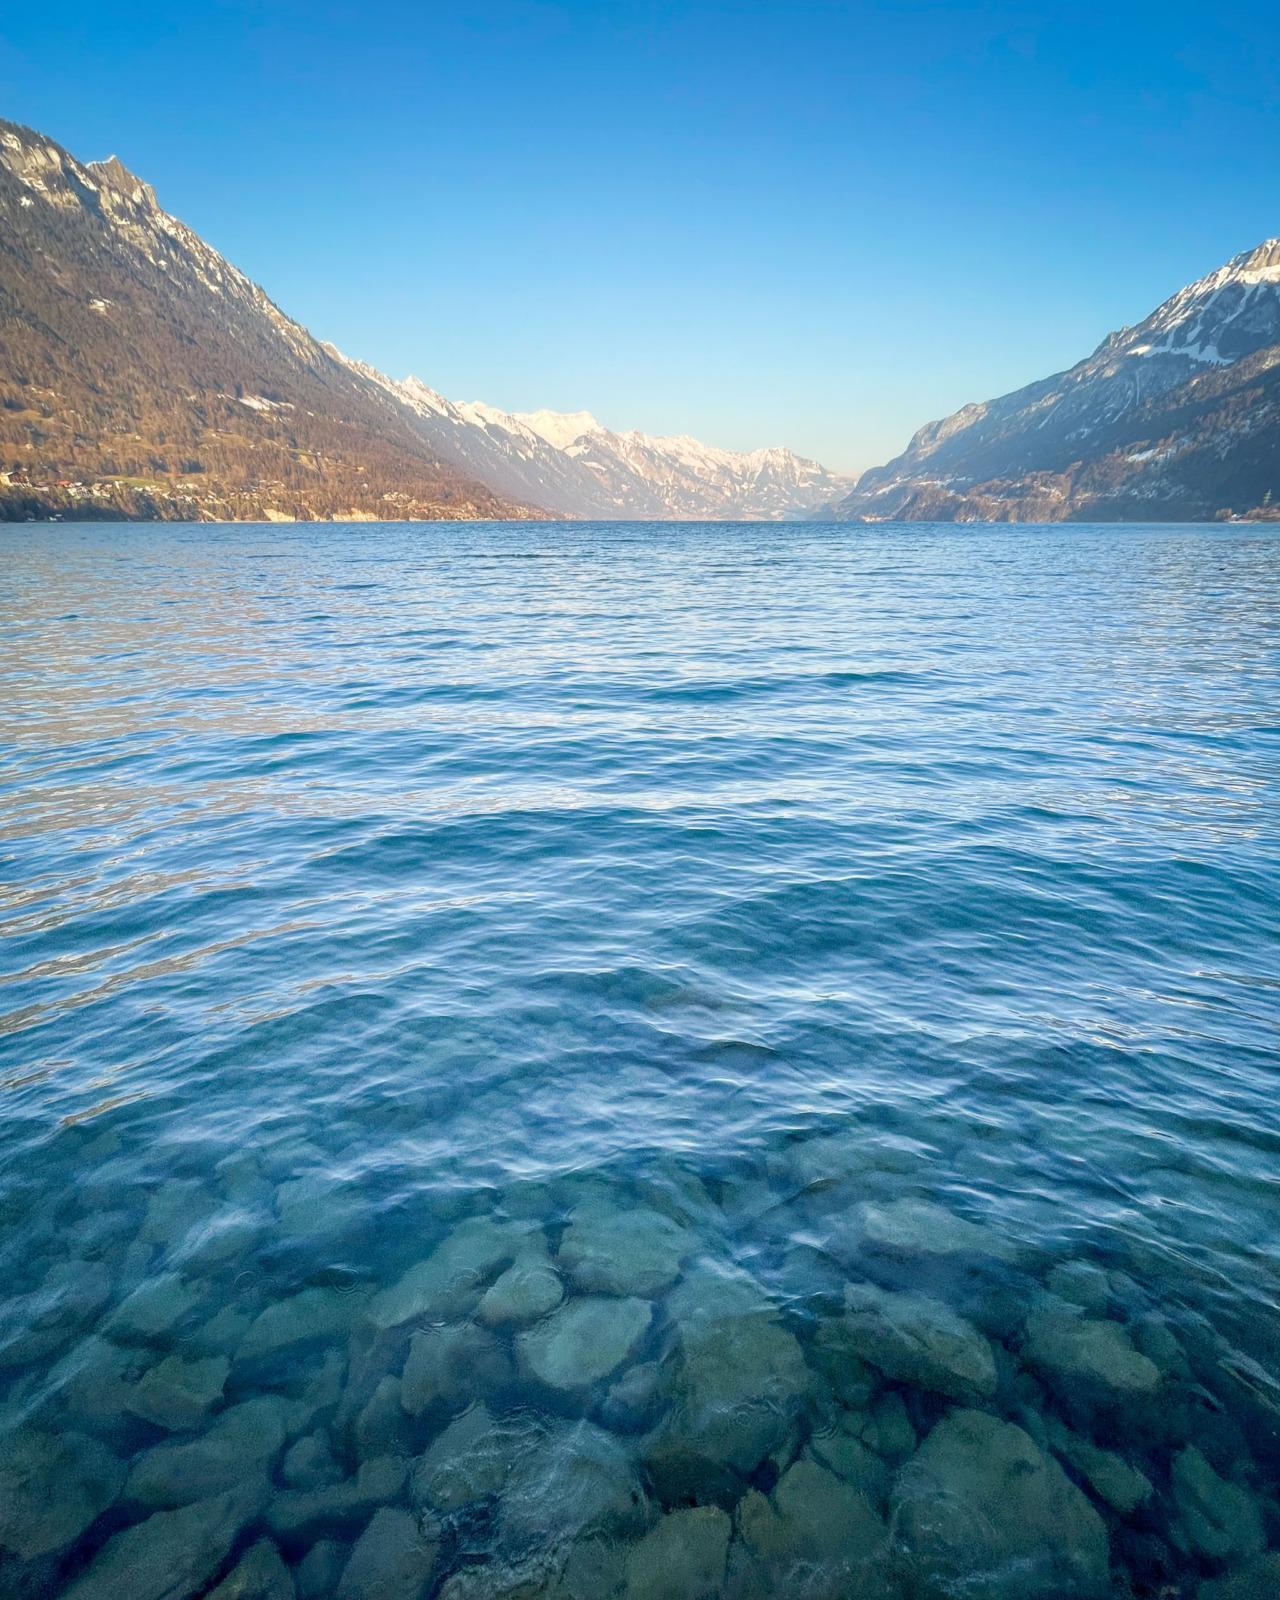 Winter lake at Bönigen